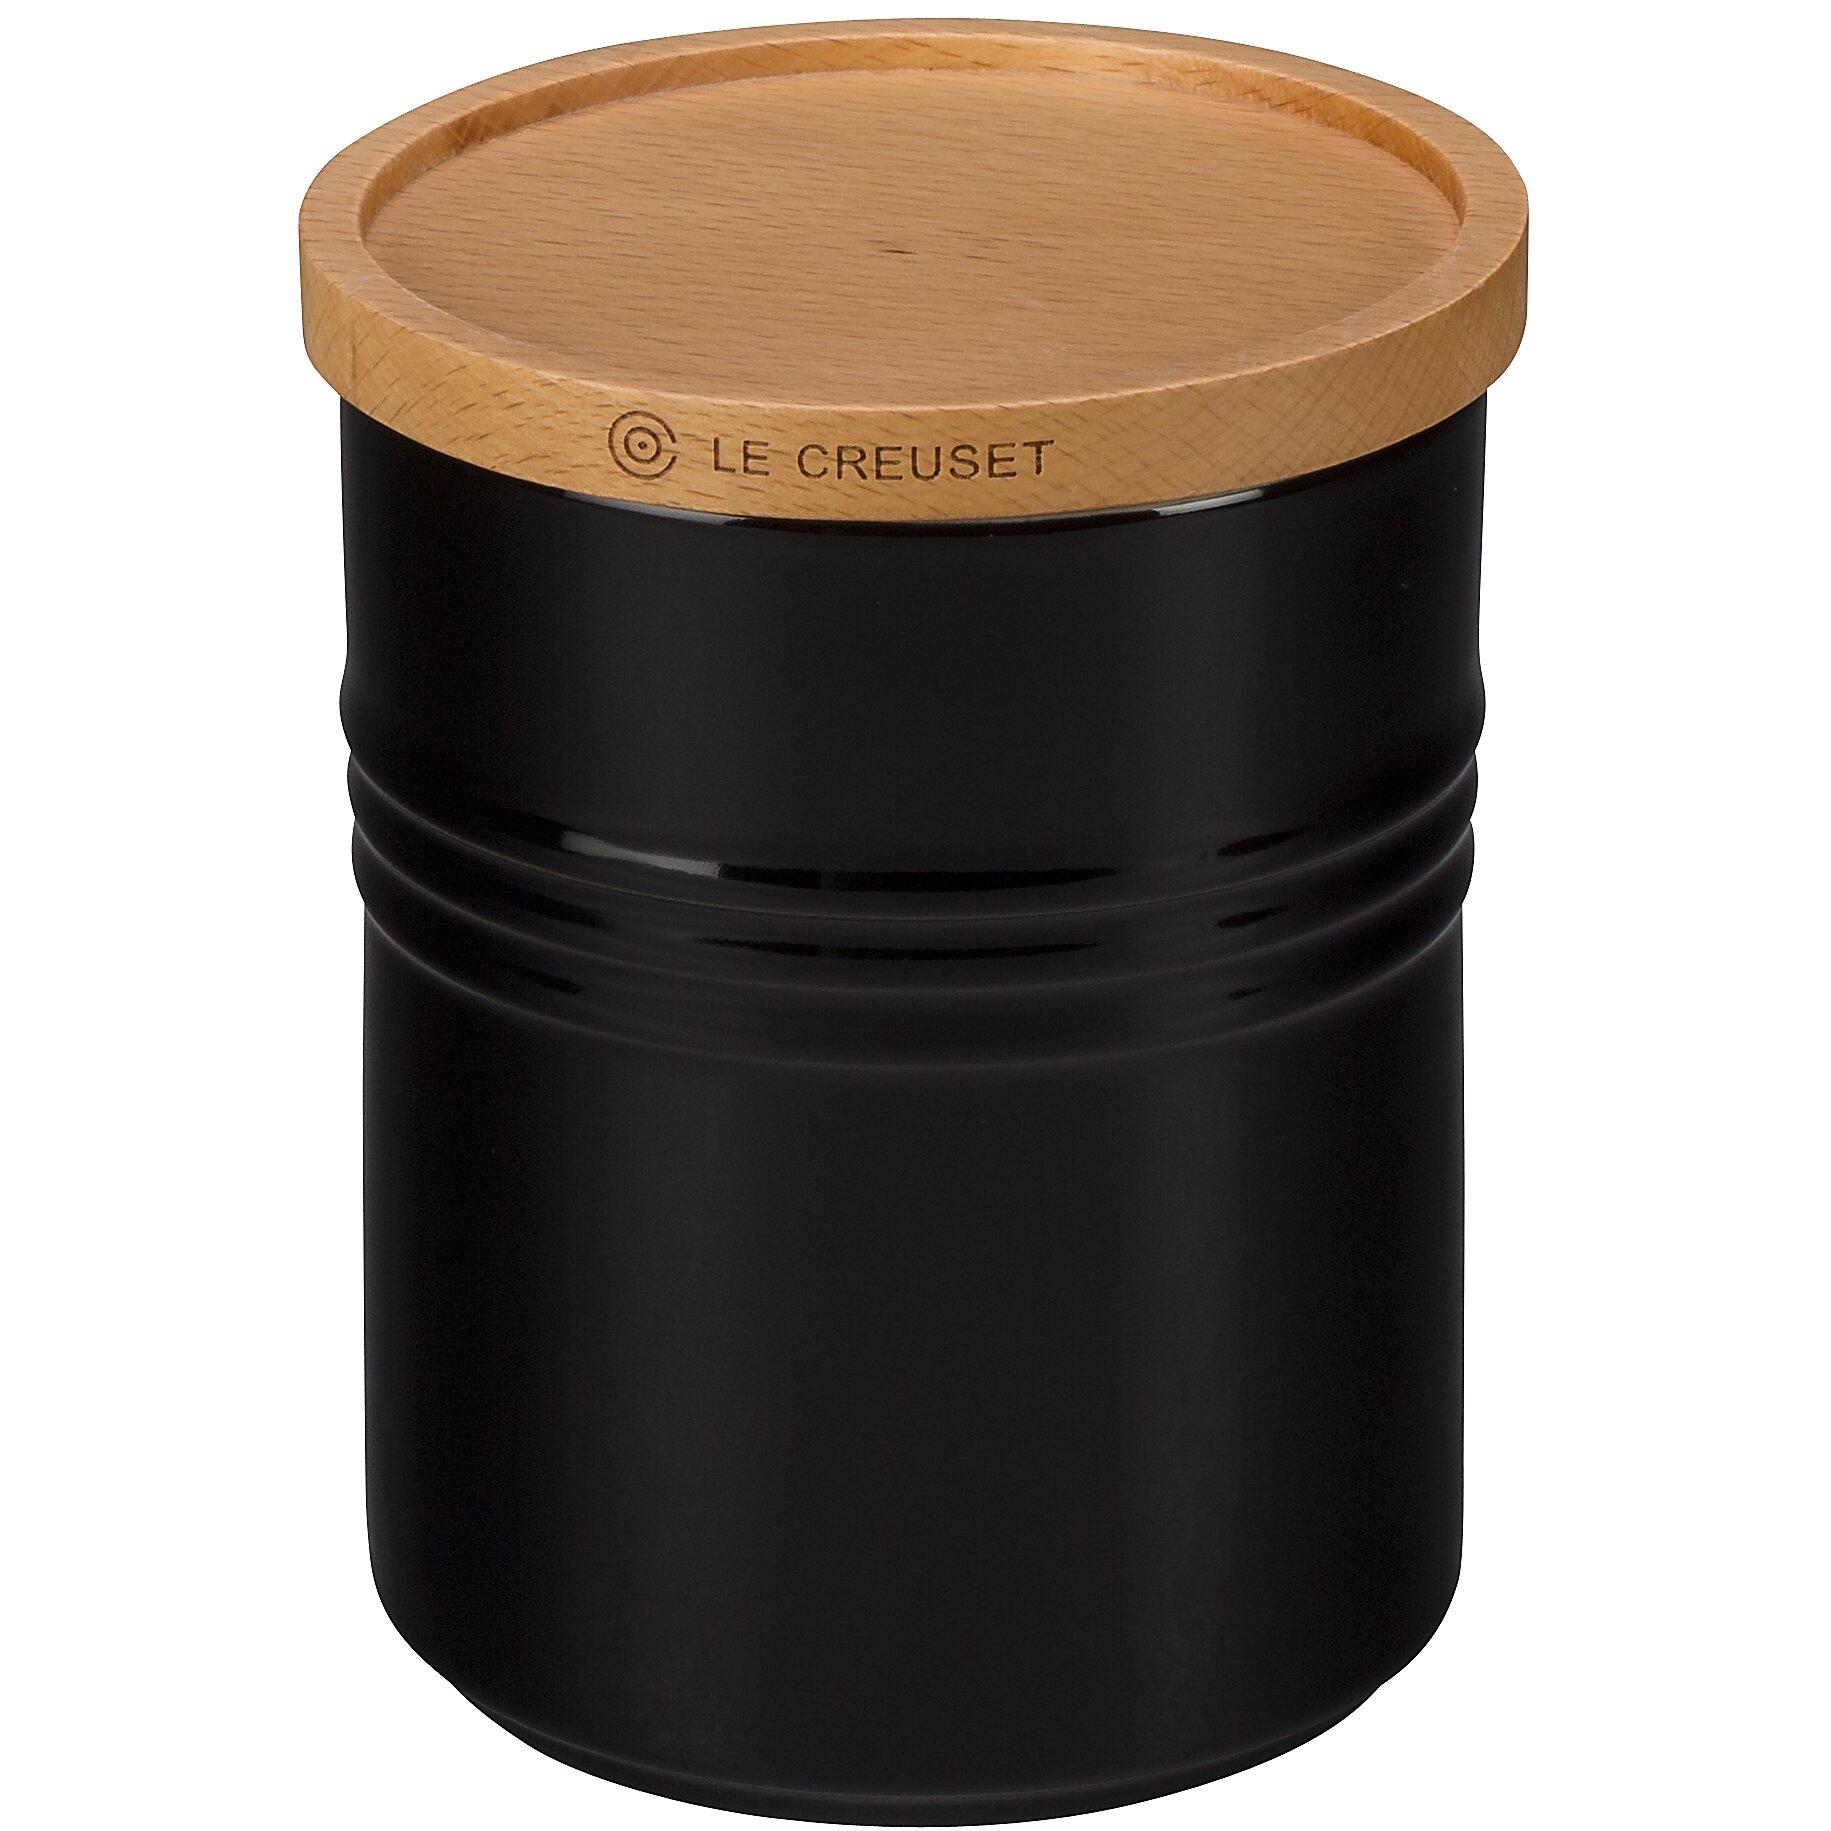 Le Creuset 2 5 Qt Canister With Wood Lid Amp Reviews Wayfair